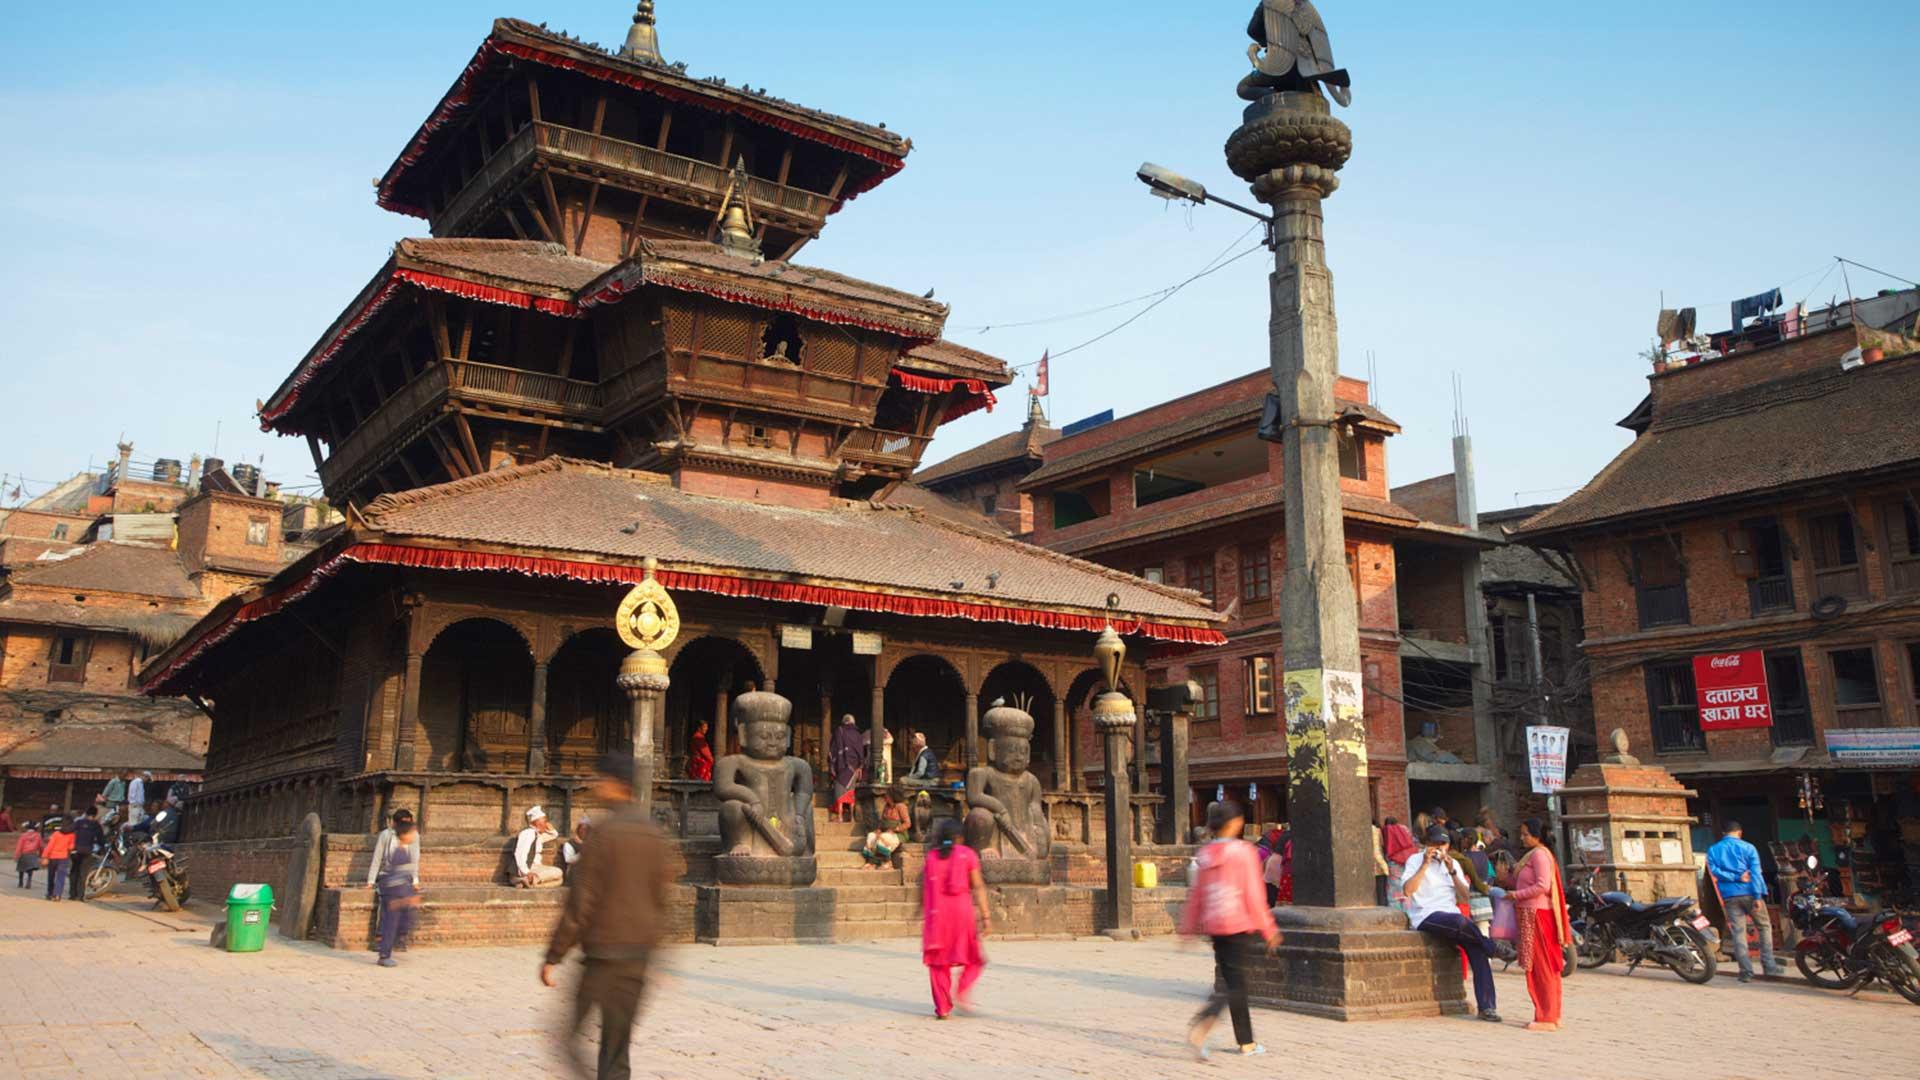 Dattatreya Temple, Tachupal Tole, Bhaktapur, a UNESCO World Heritage Site